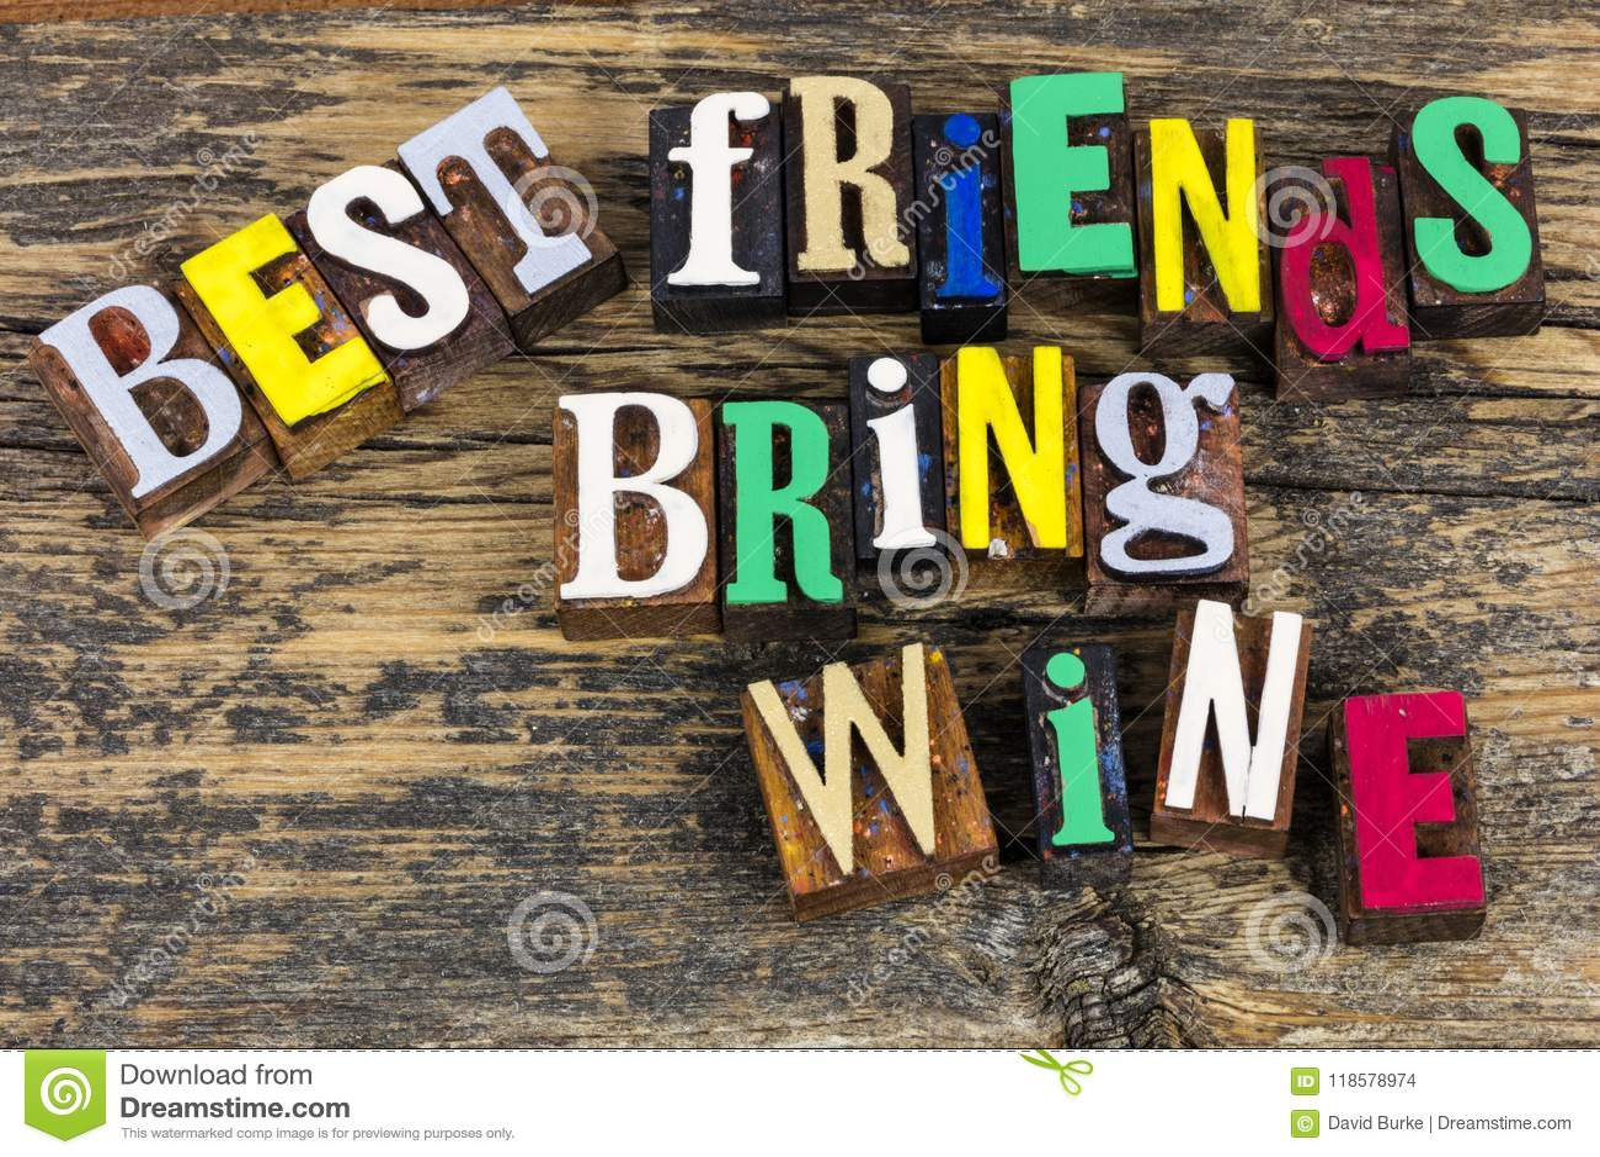 Best Friends Bring Wine Friendship Bff Stock Photo - Image